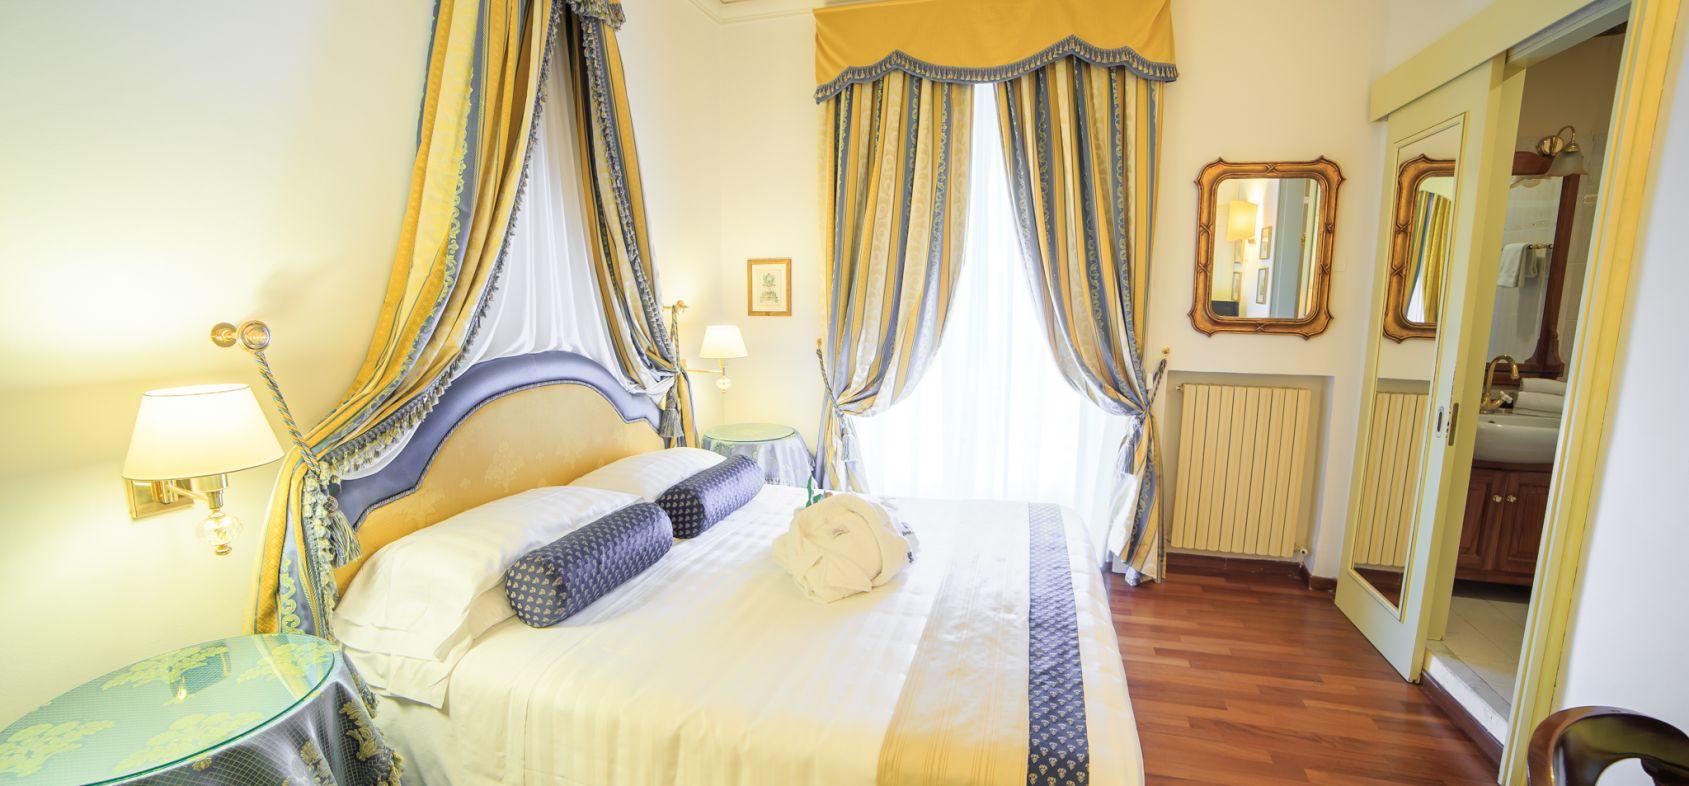 Pastine hotels: accoglienza e ospitalità